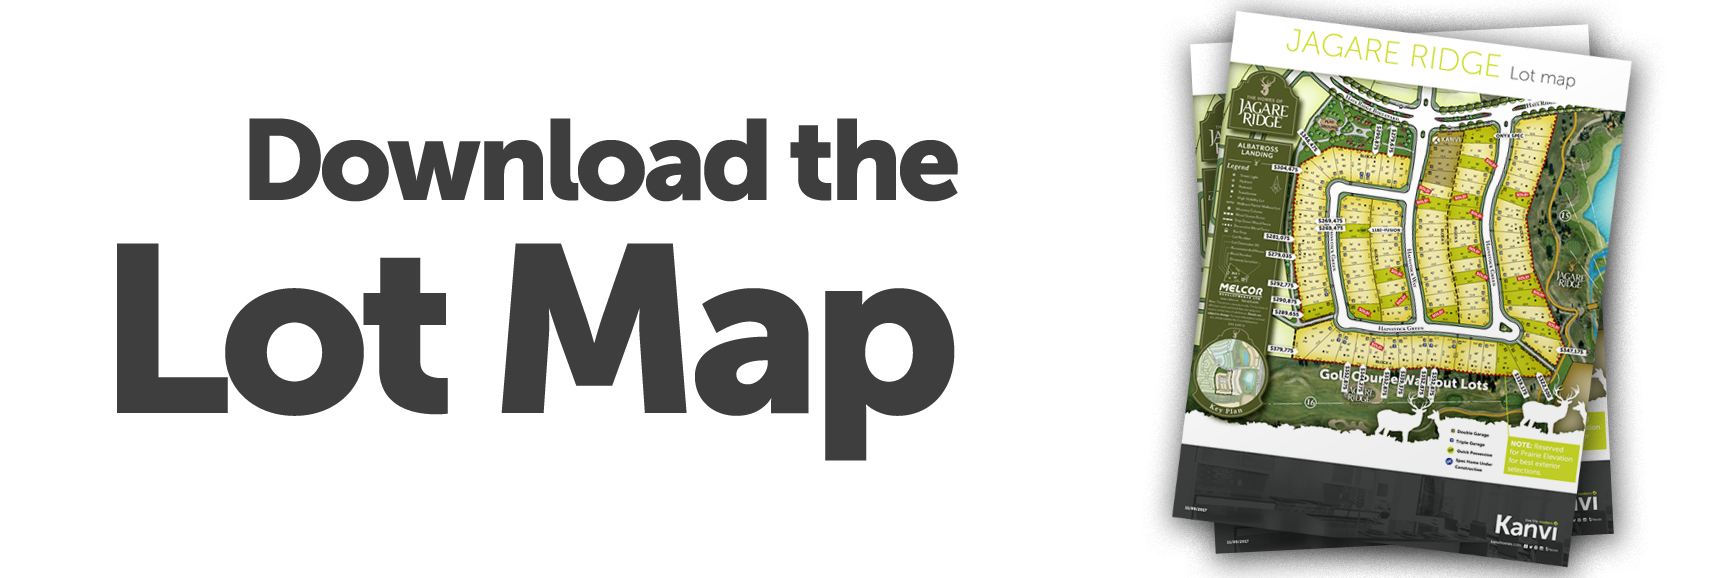 JR-lot-map.png